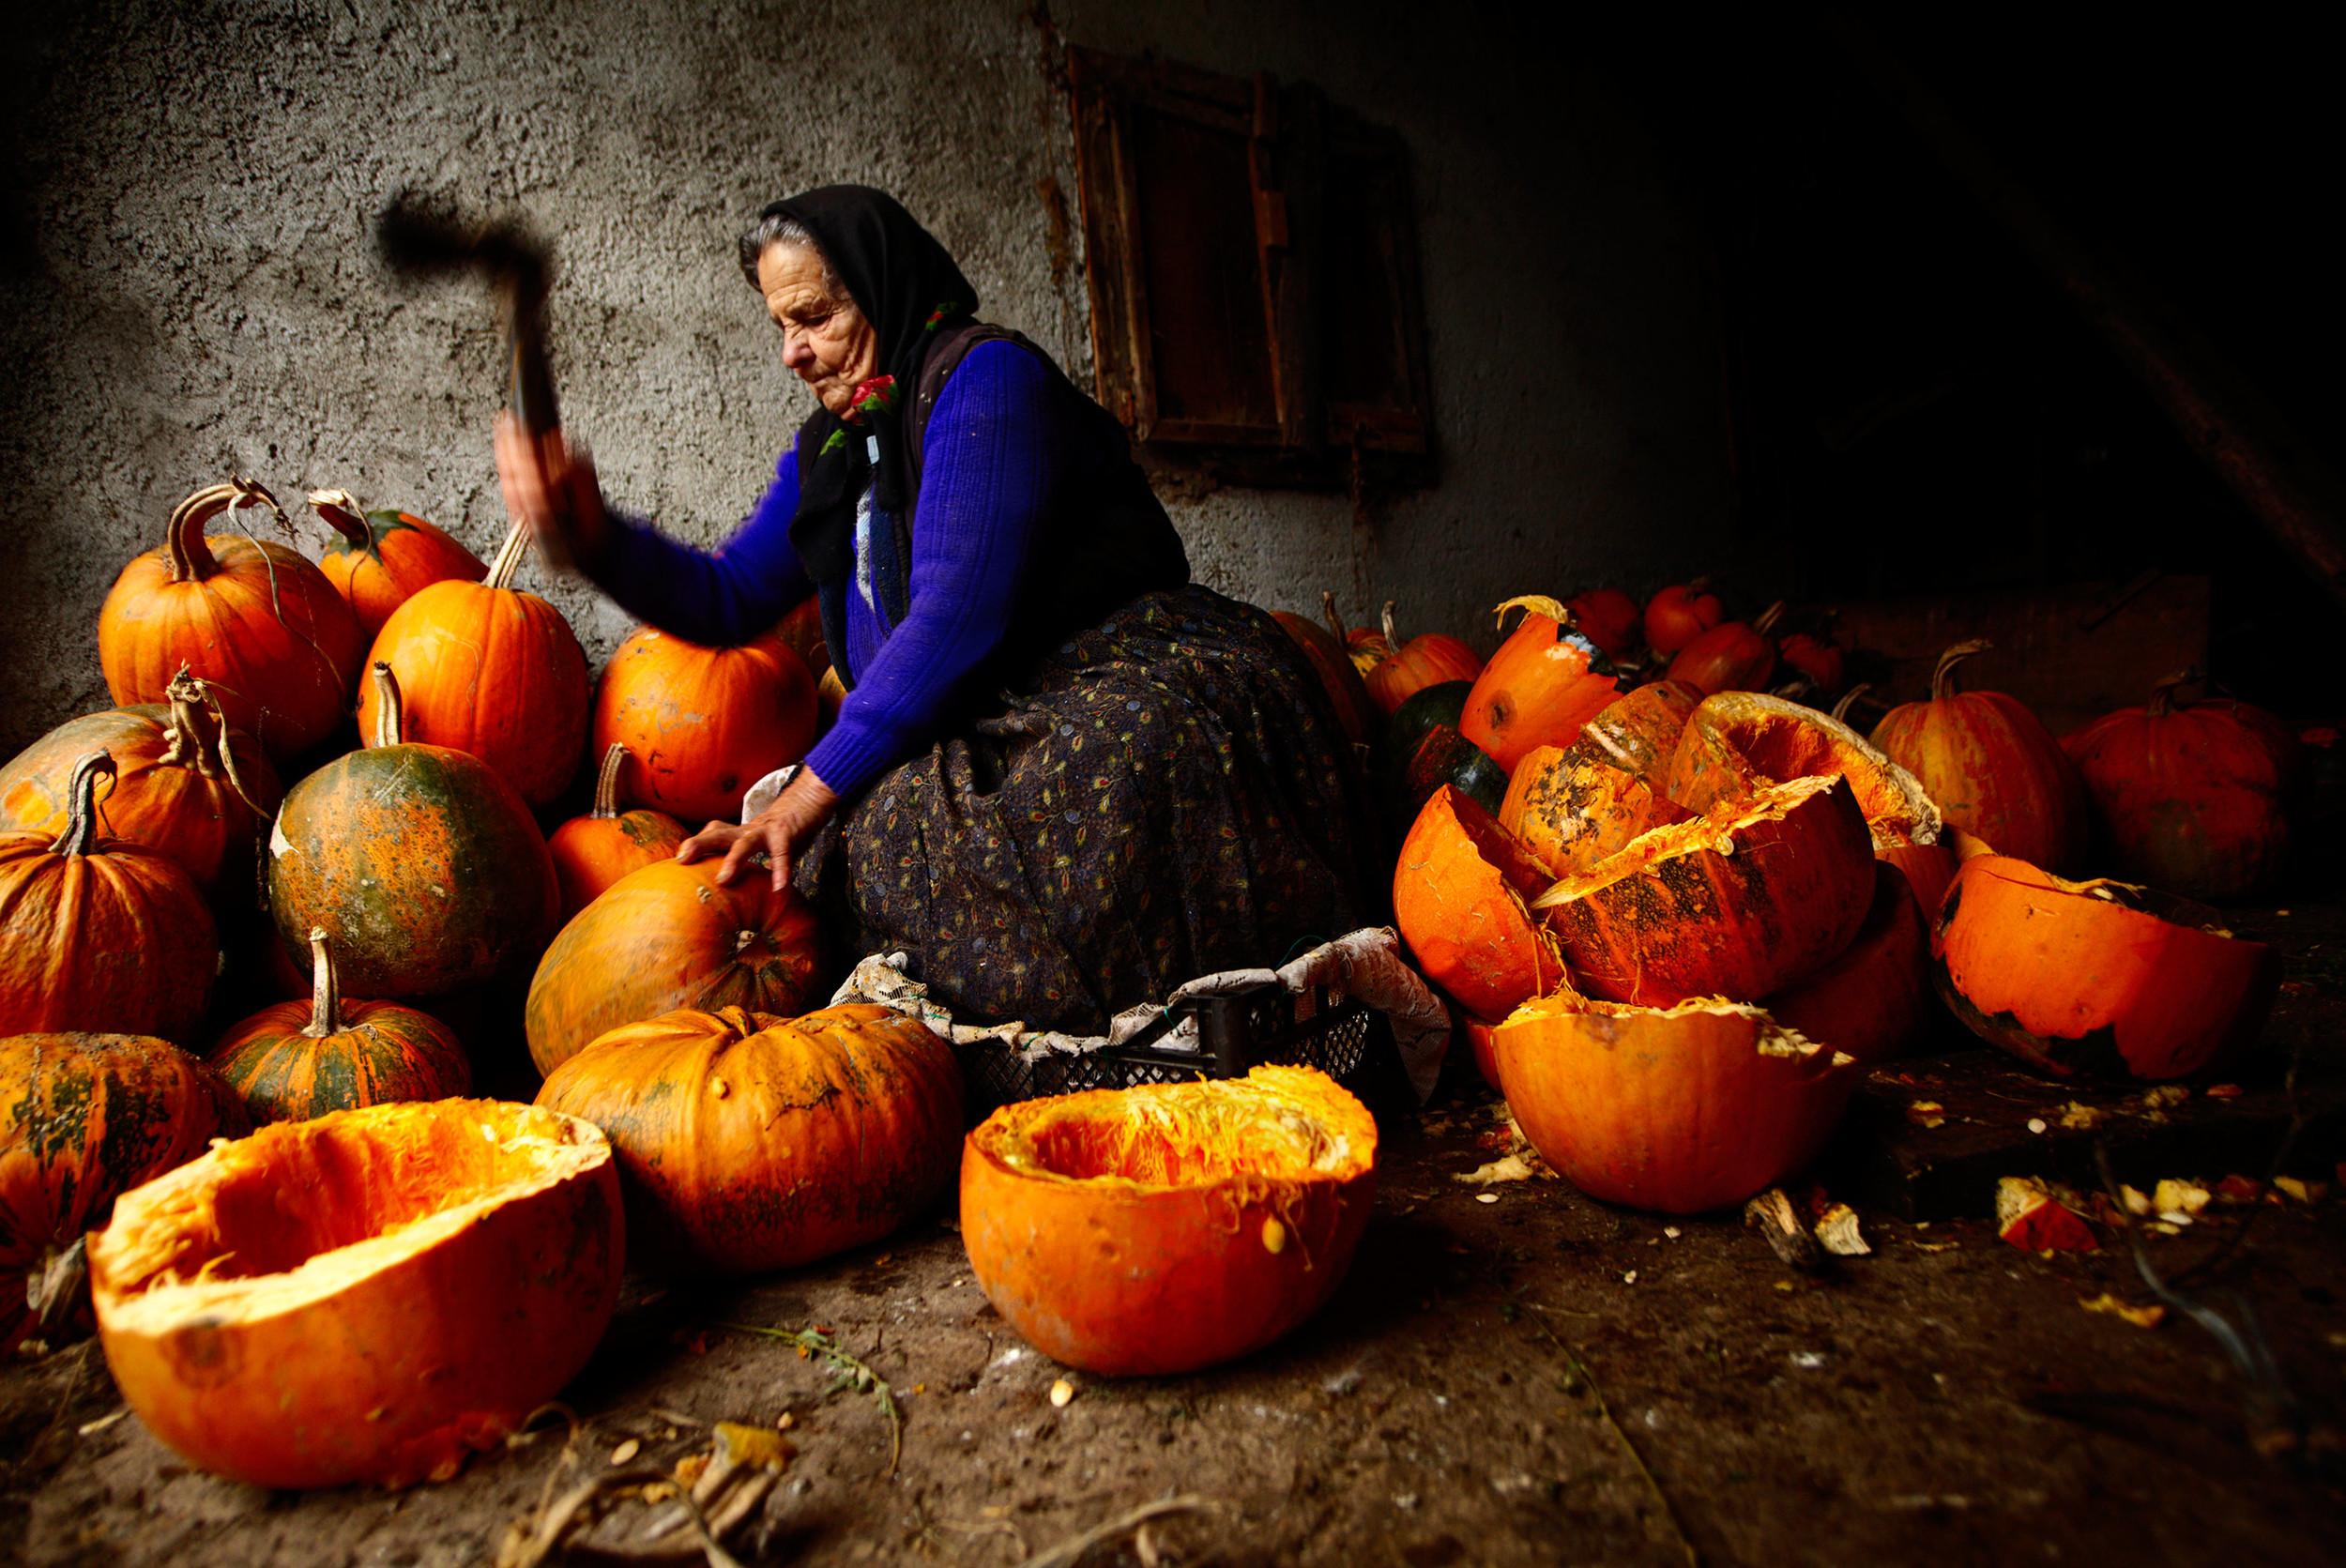 Romanian woman chopping pumpkins in her shed